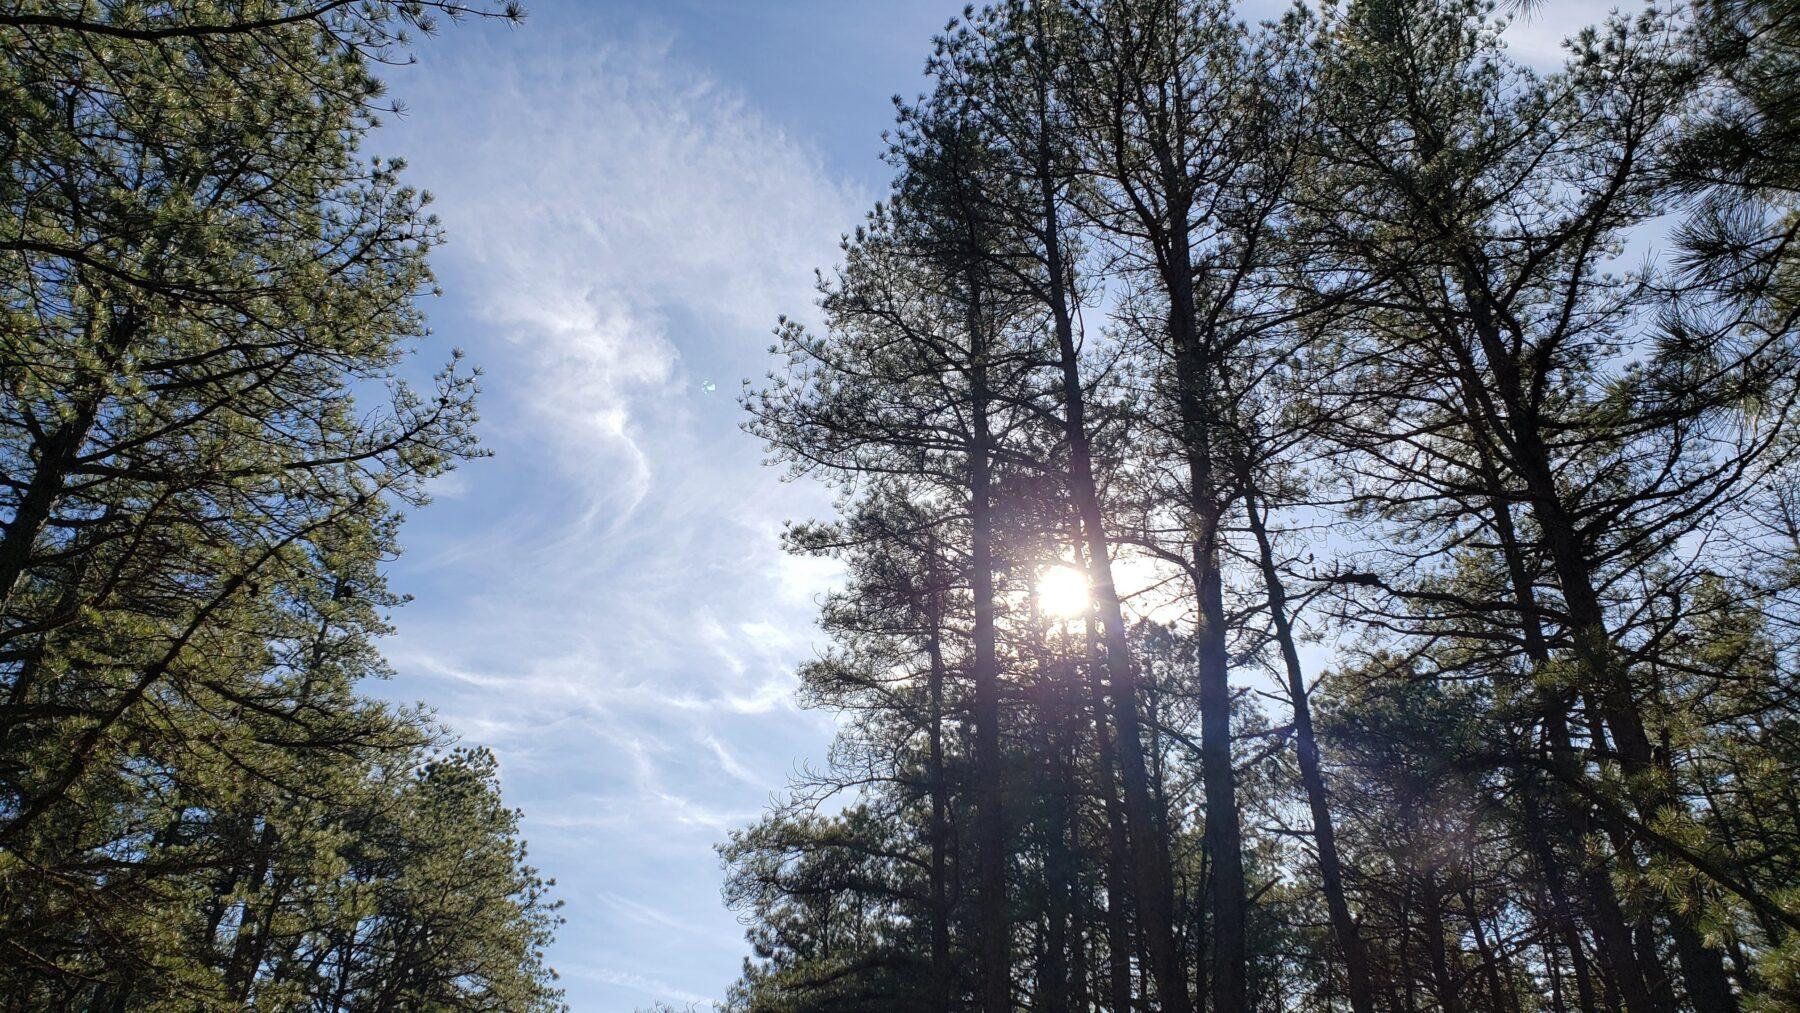 view of sun through pitch pine needles cranberry bog county park